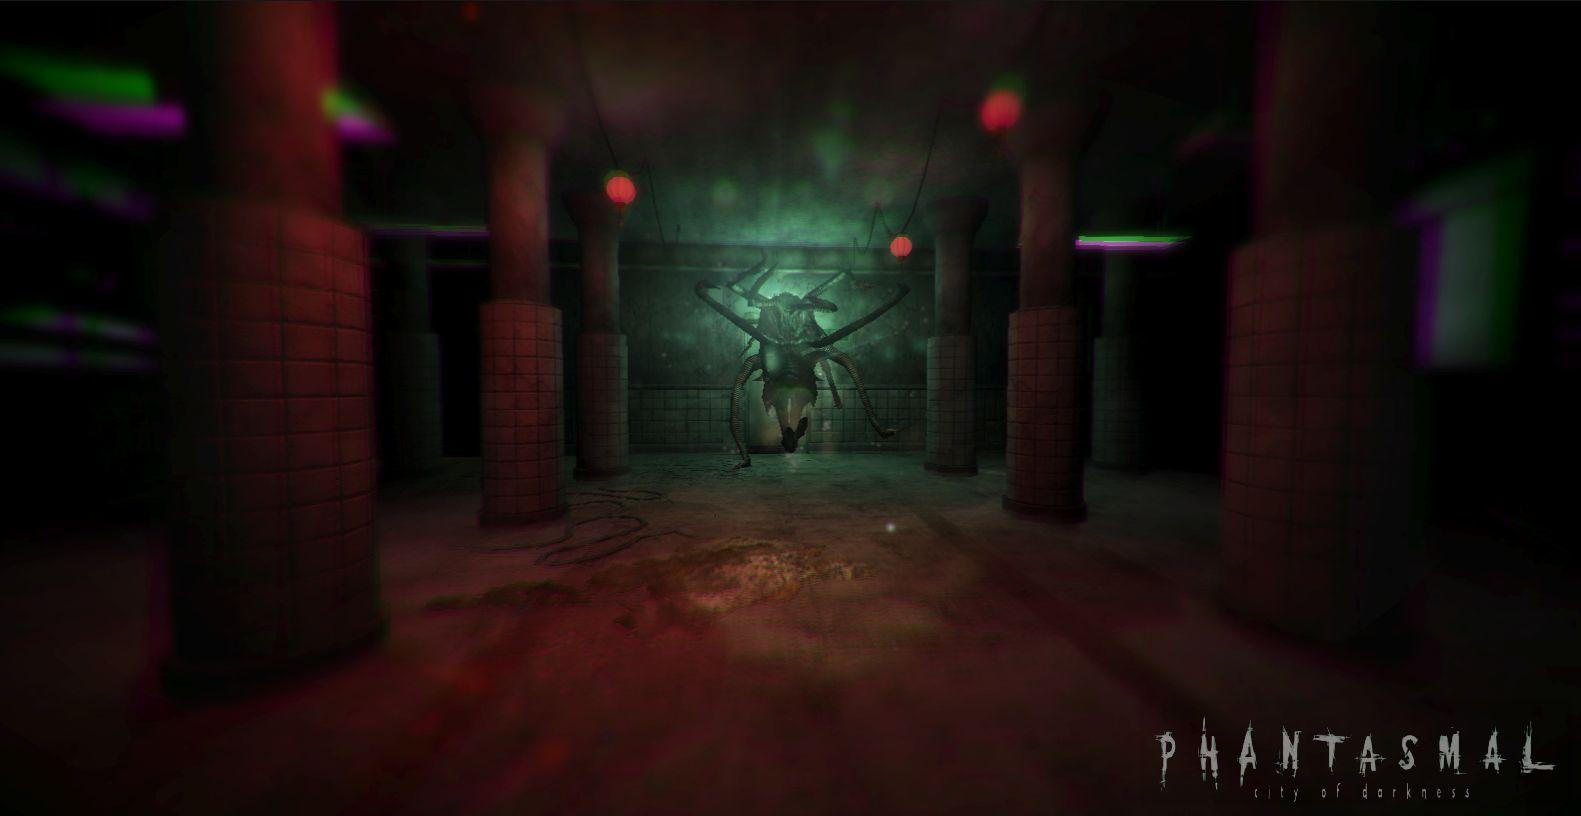 Phantasmal Pics, Video Game Collection